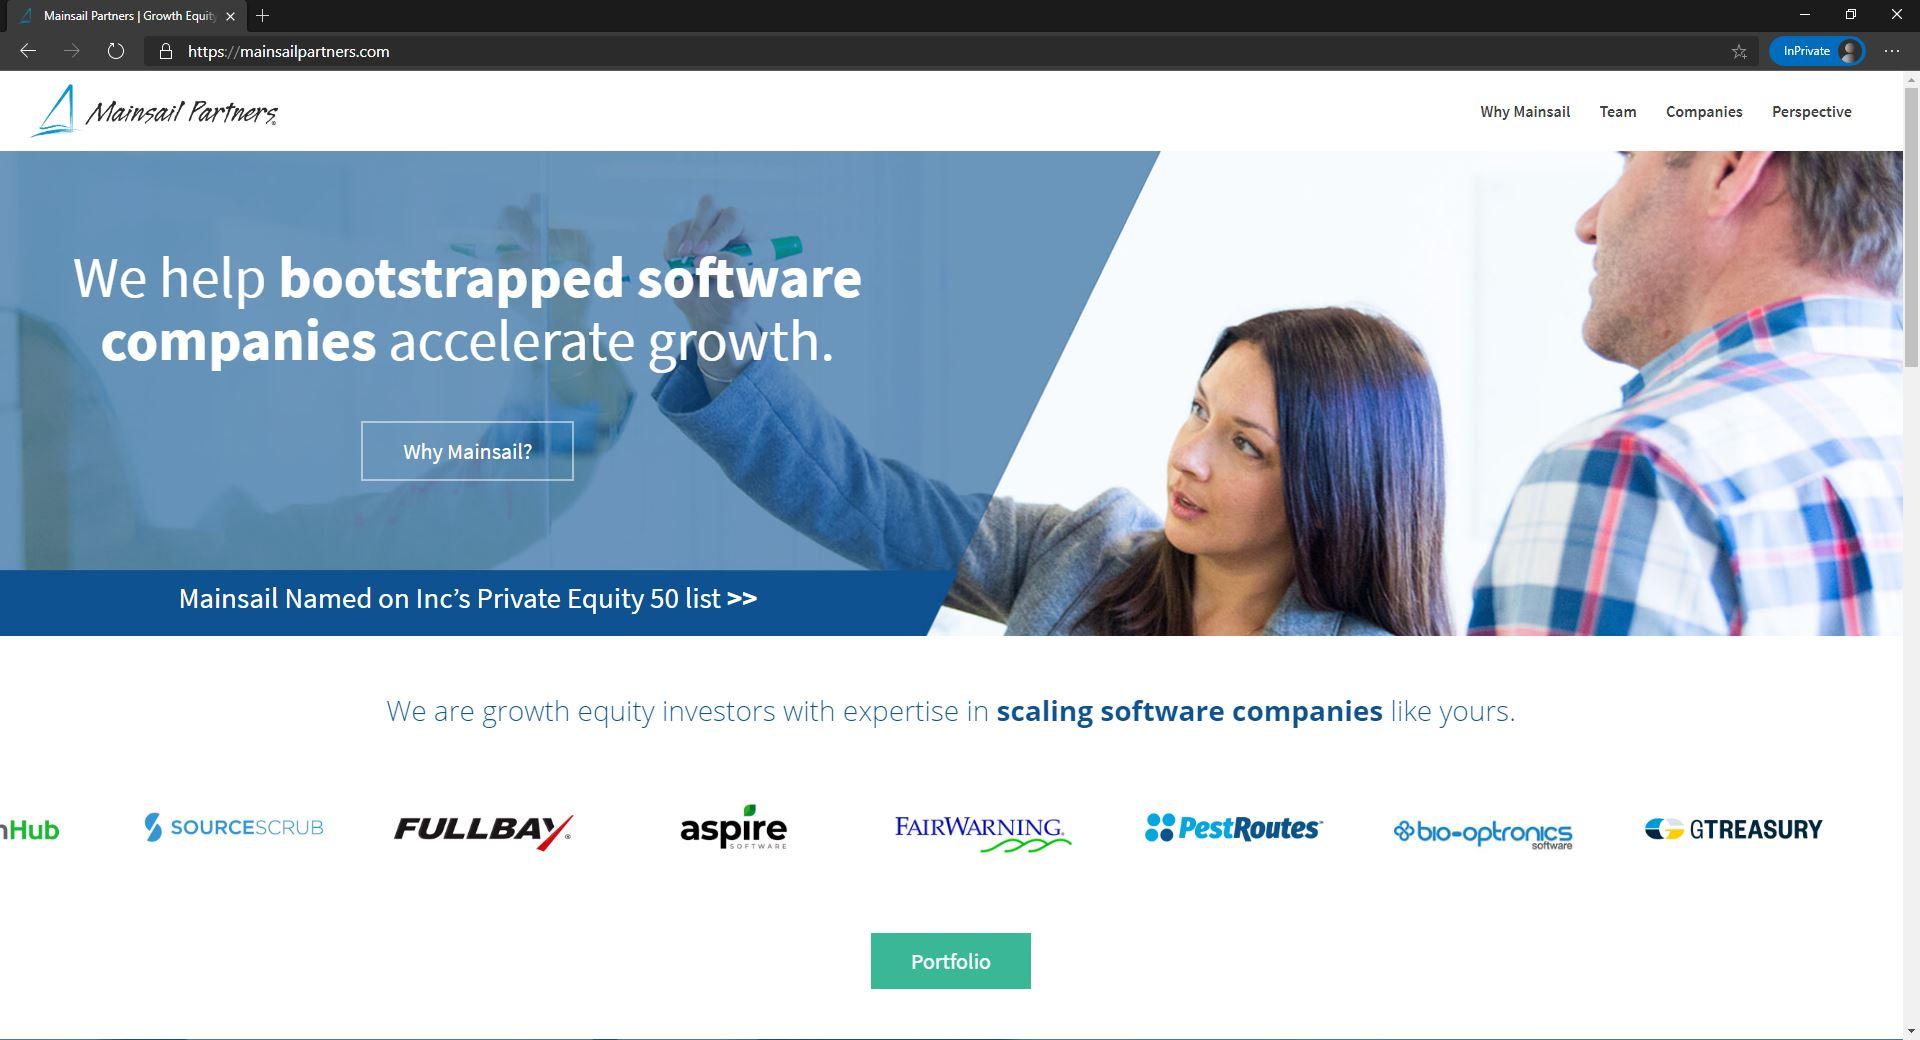 Mainsail Partners website